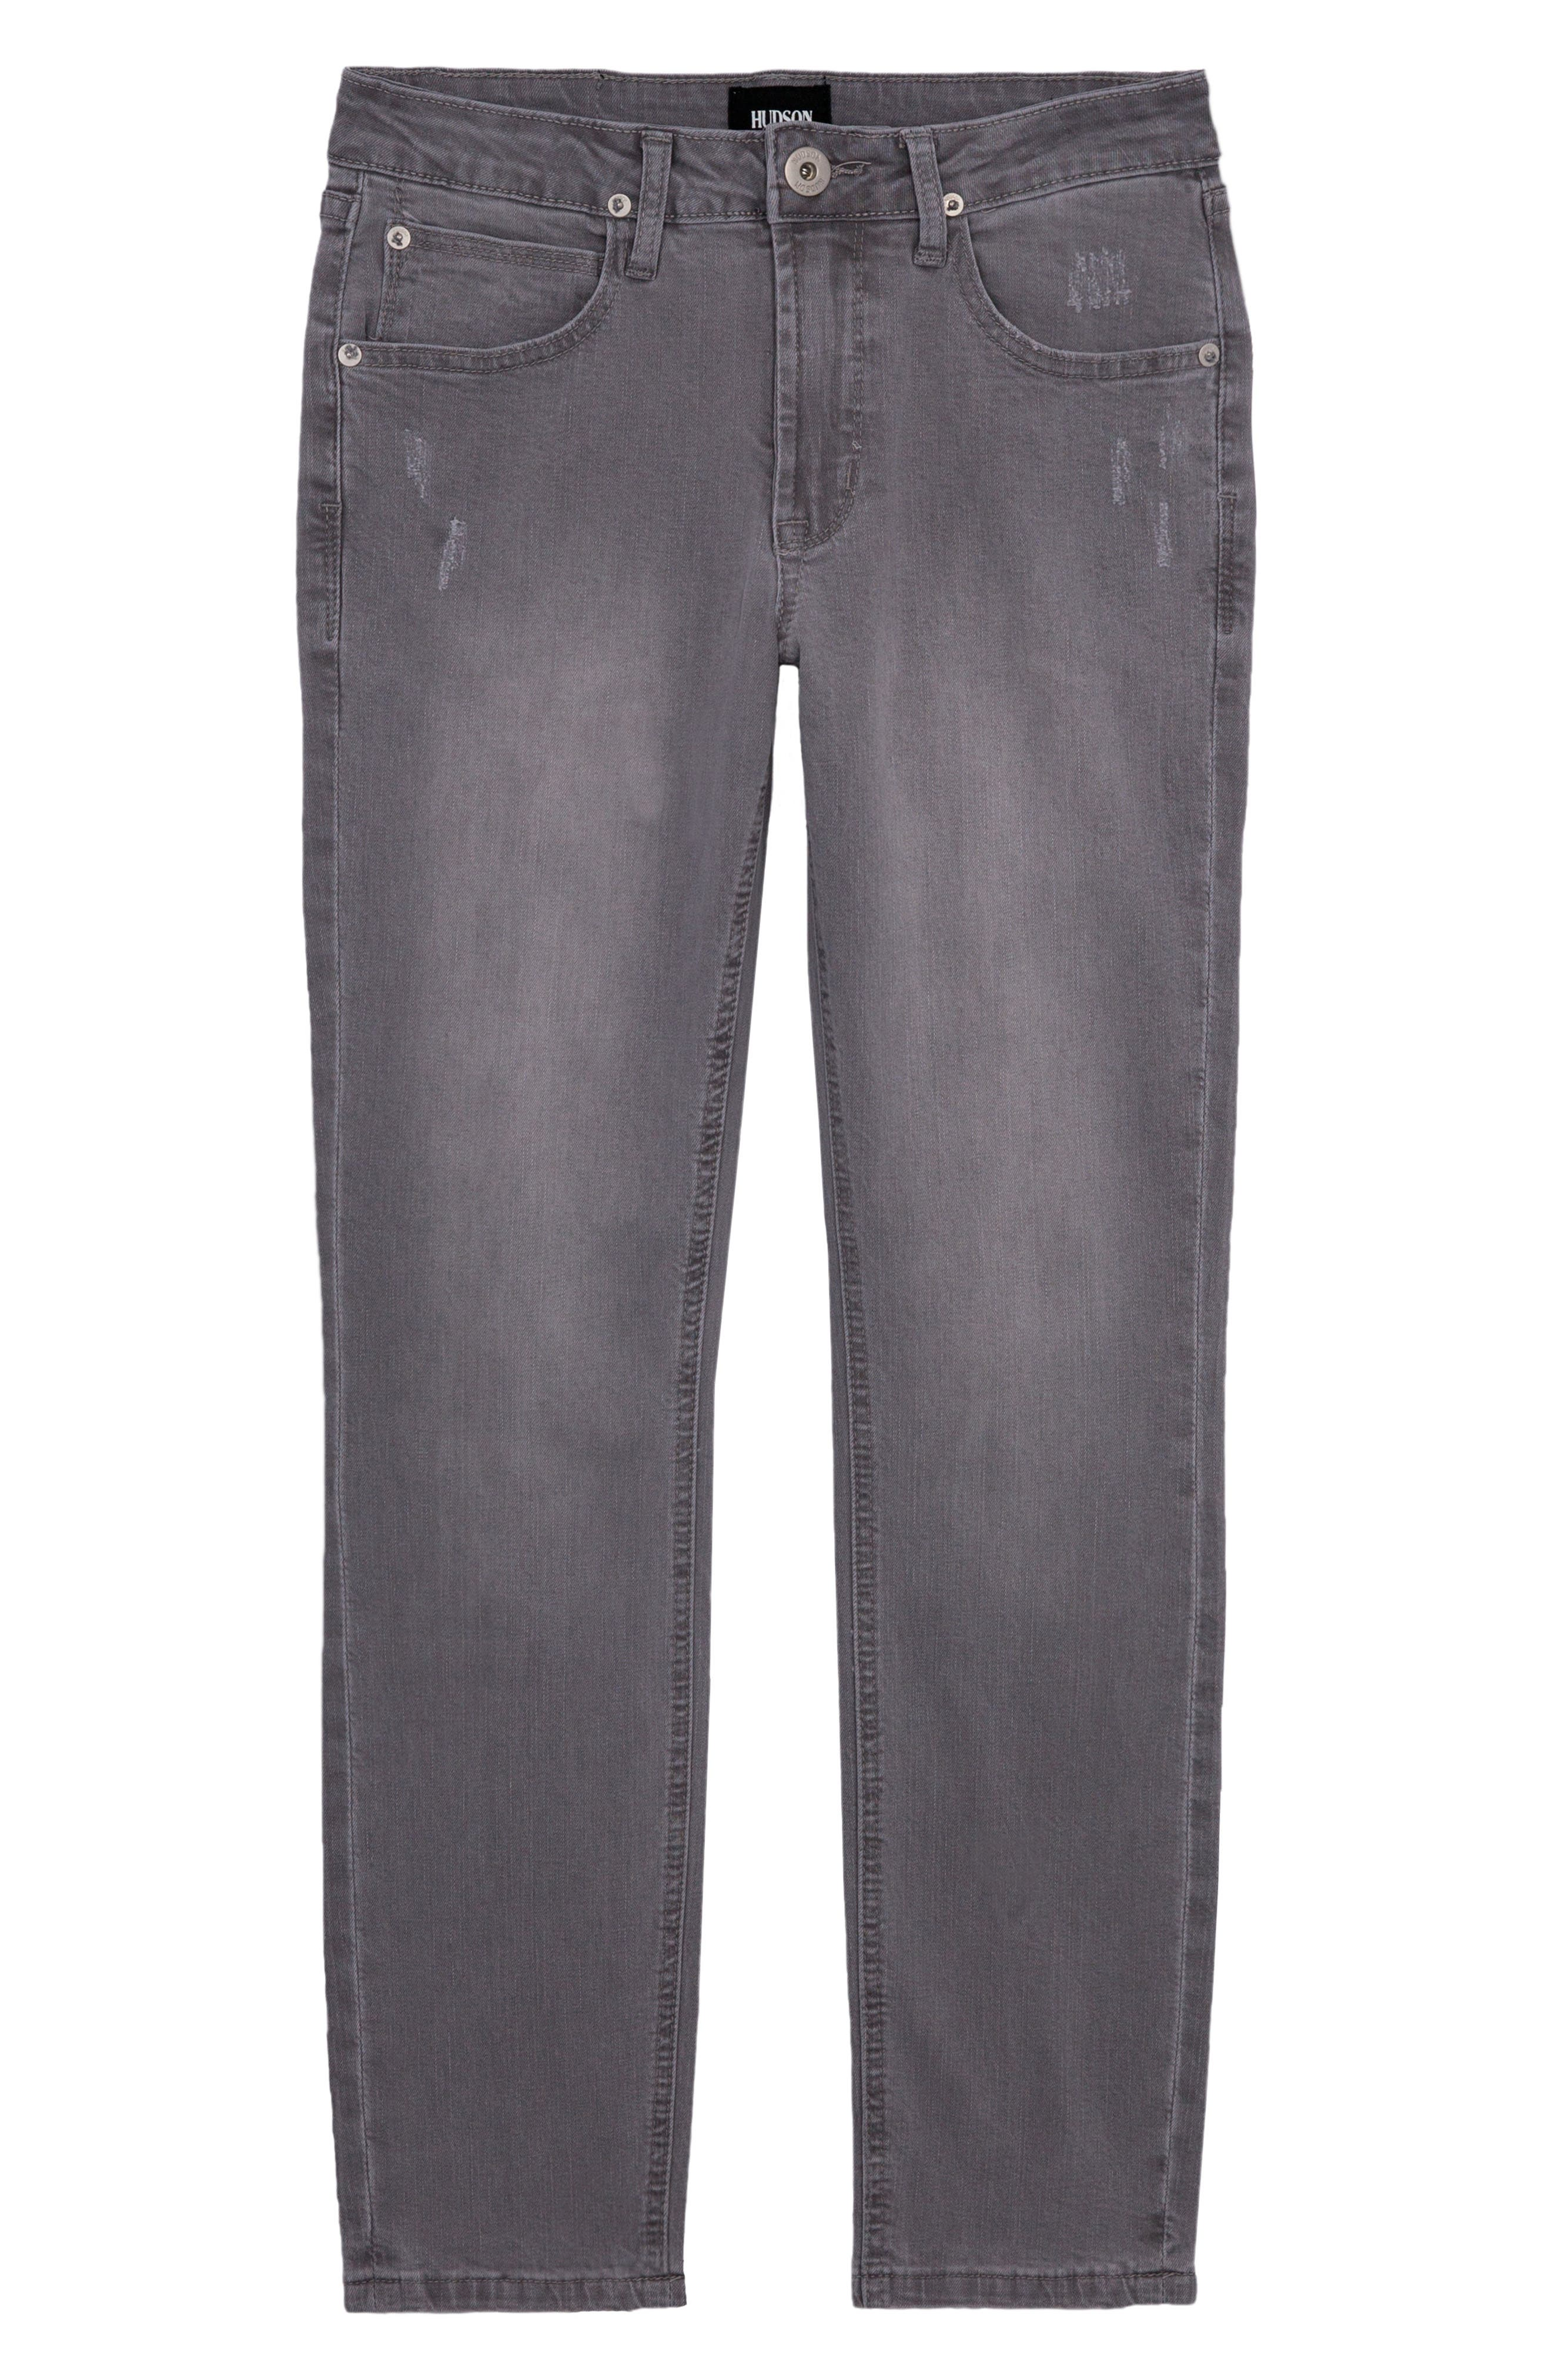 HUDSON KIDS Straight Leg Jeans, Main, color, 050